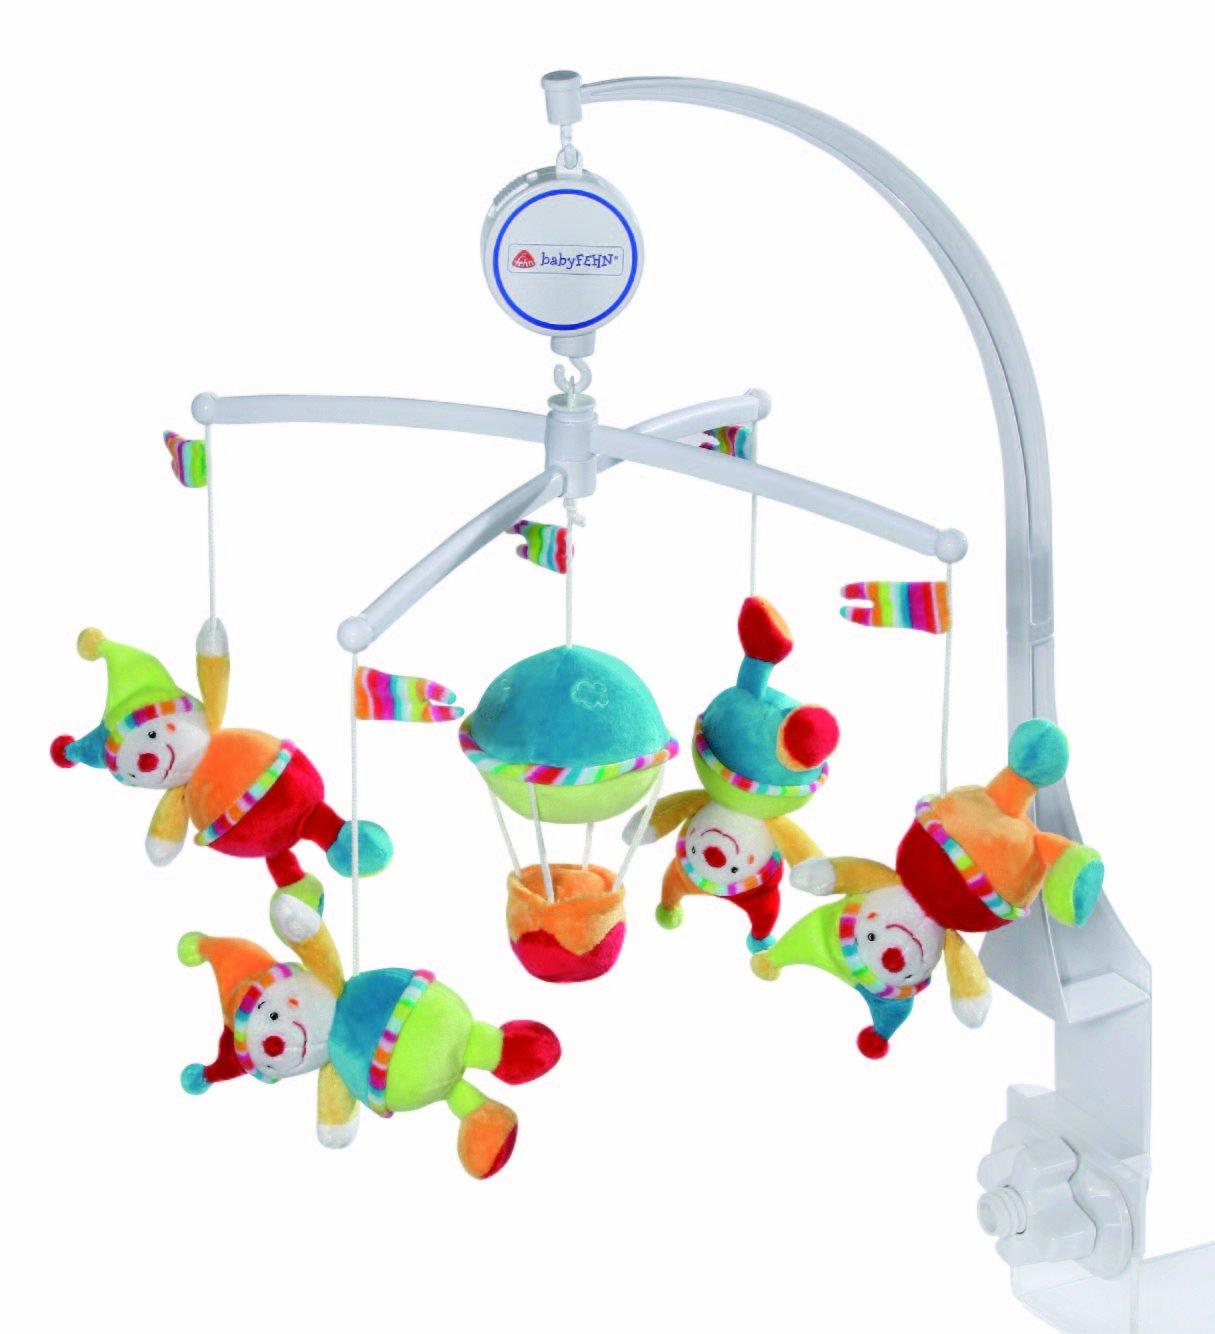 mobile babyfehn mit musik bunte clowns ballon ebay. Black Bedroom Furniture Sets. Home Design Ideas